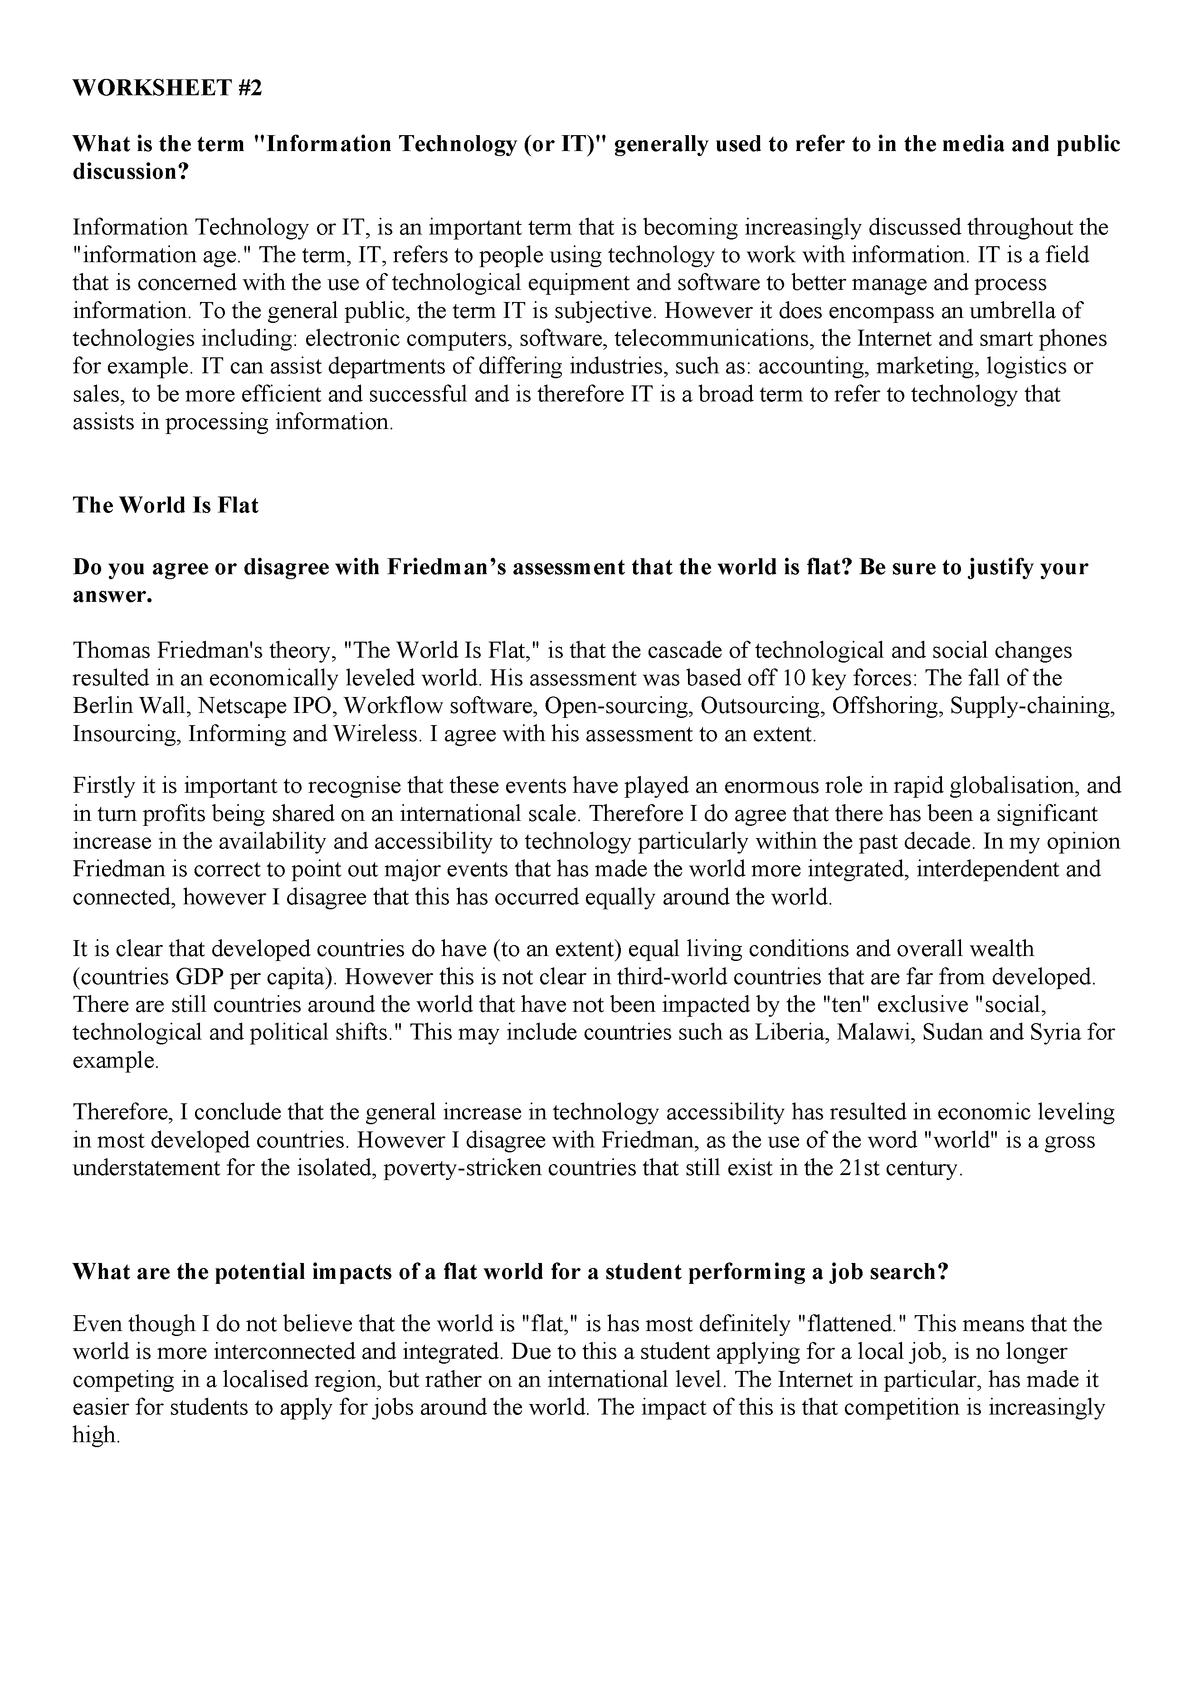 BIS Worksheet #2 - Notes - 10830 - StuDocu